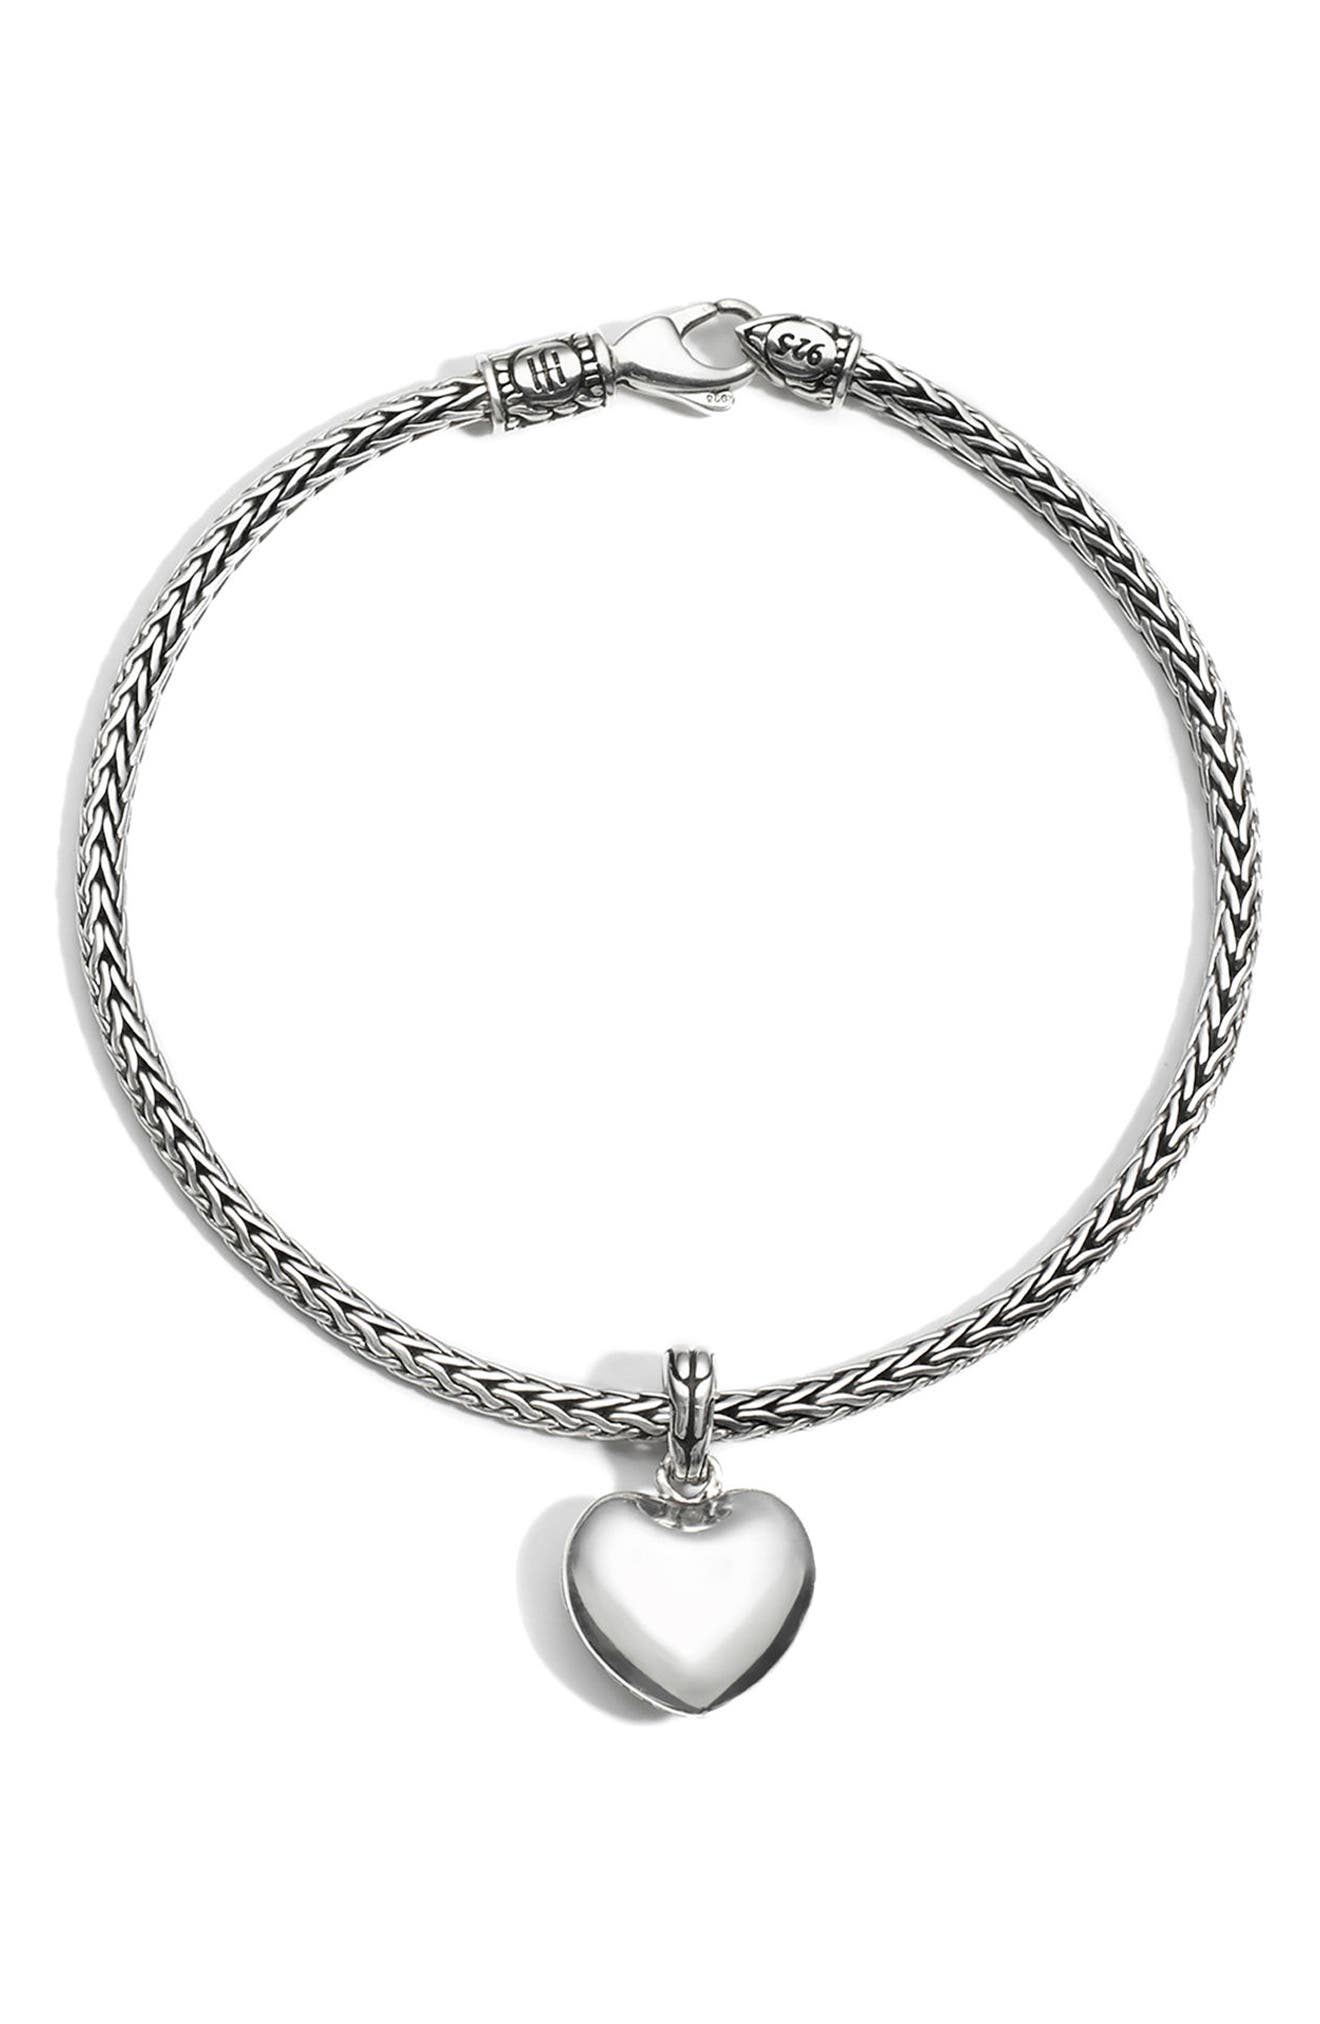 Heart Charm Chain Bracelet,                             Main thumbnail 1, color,                             SILVER